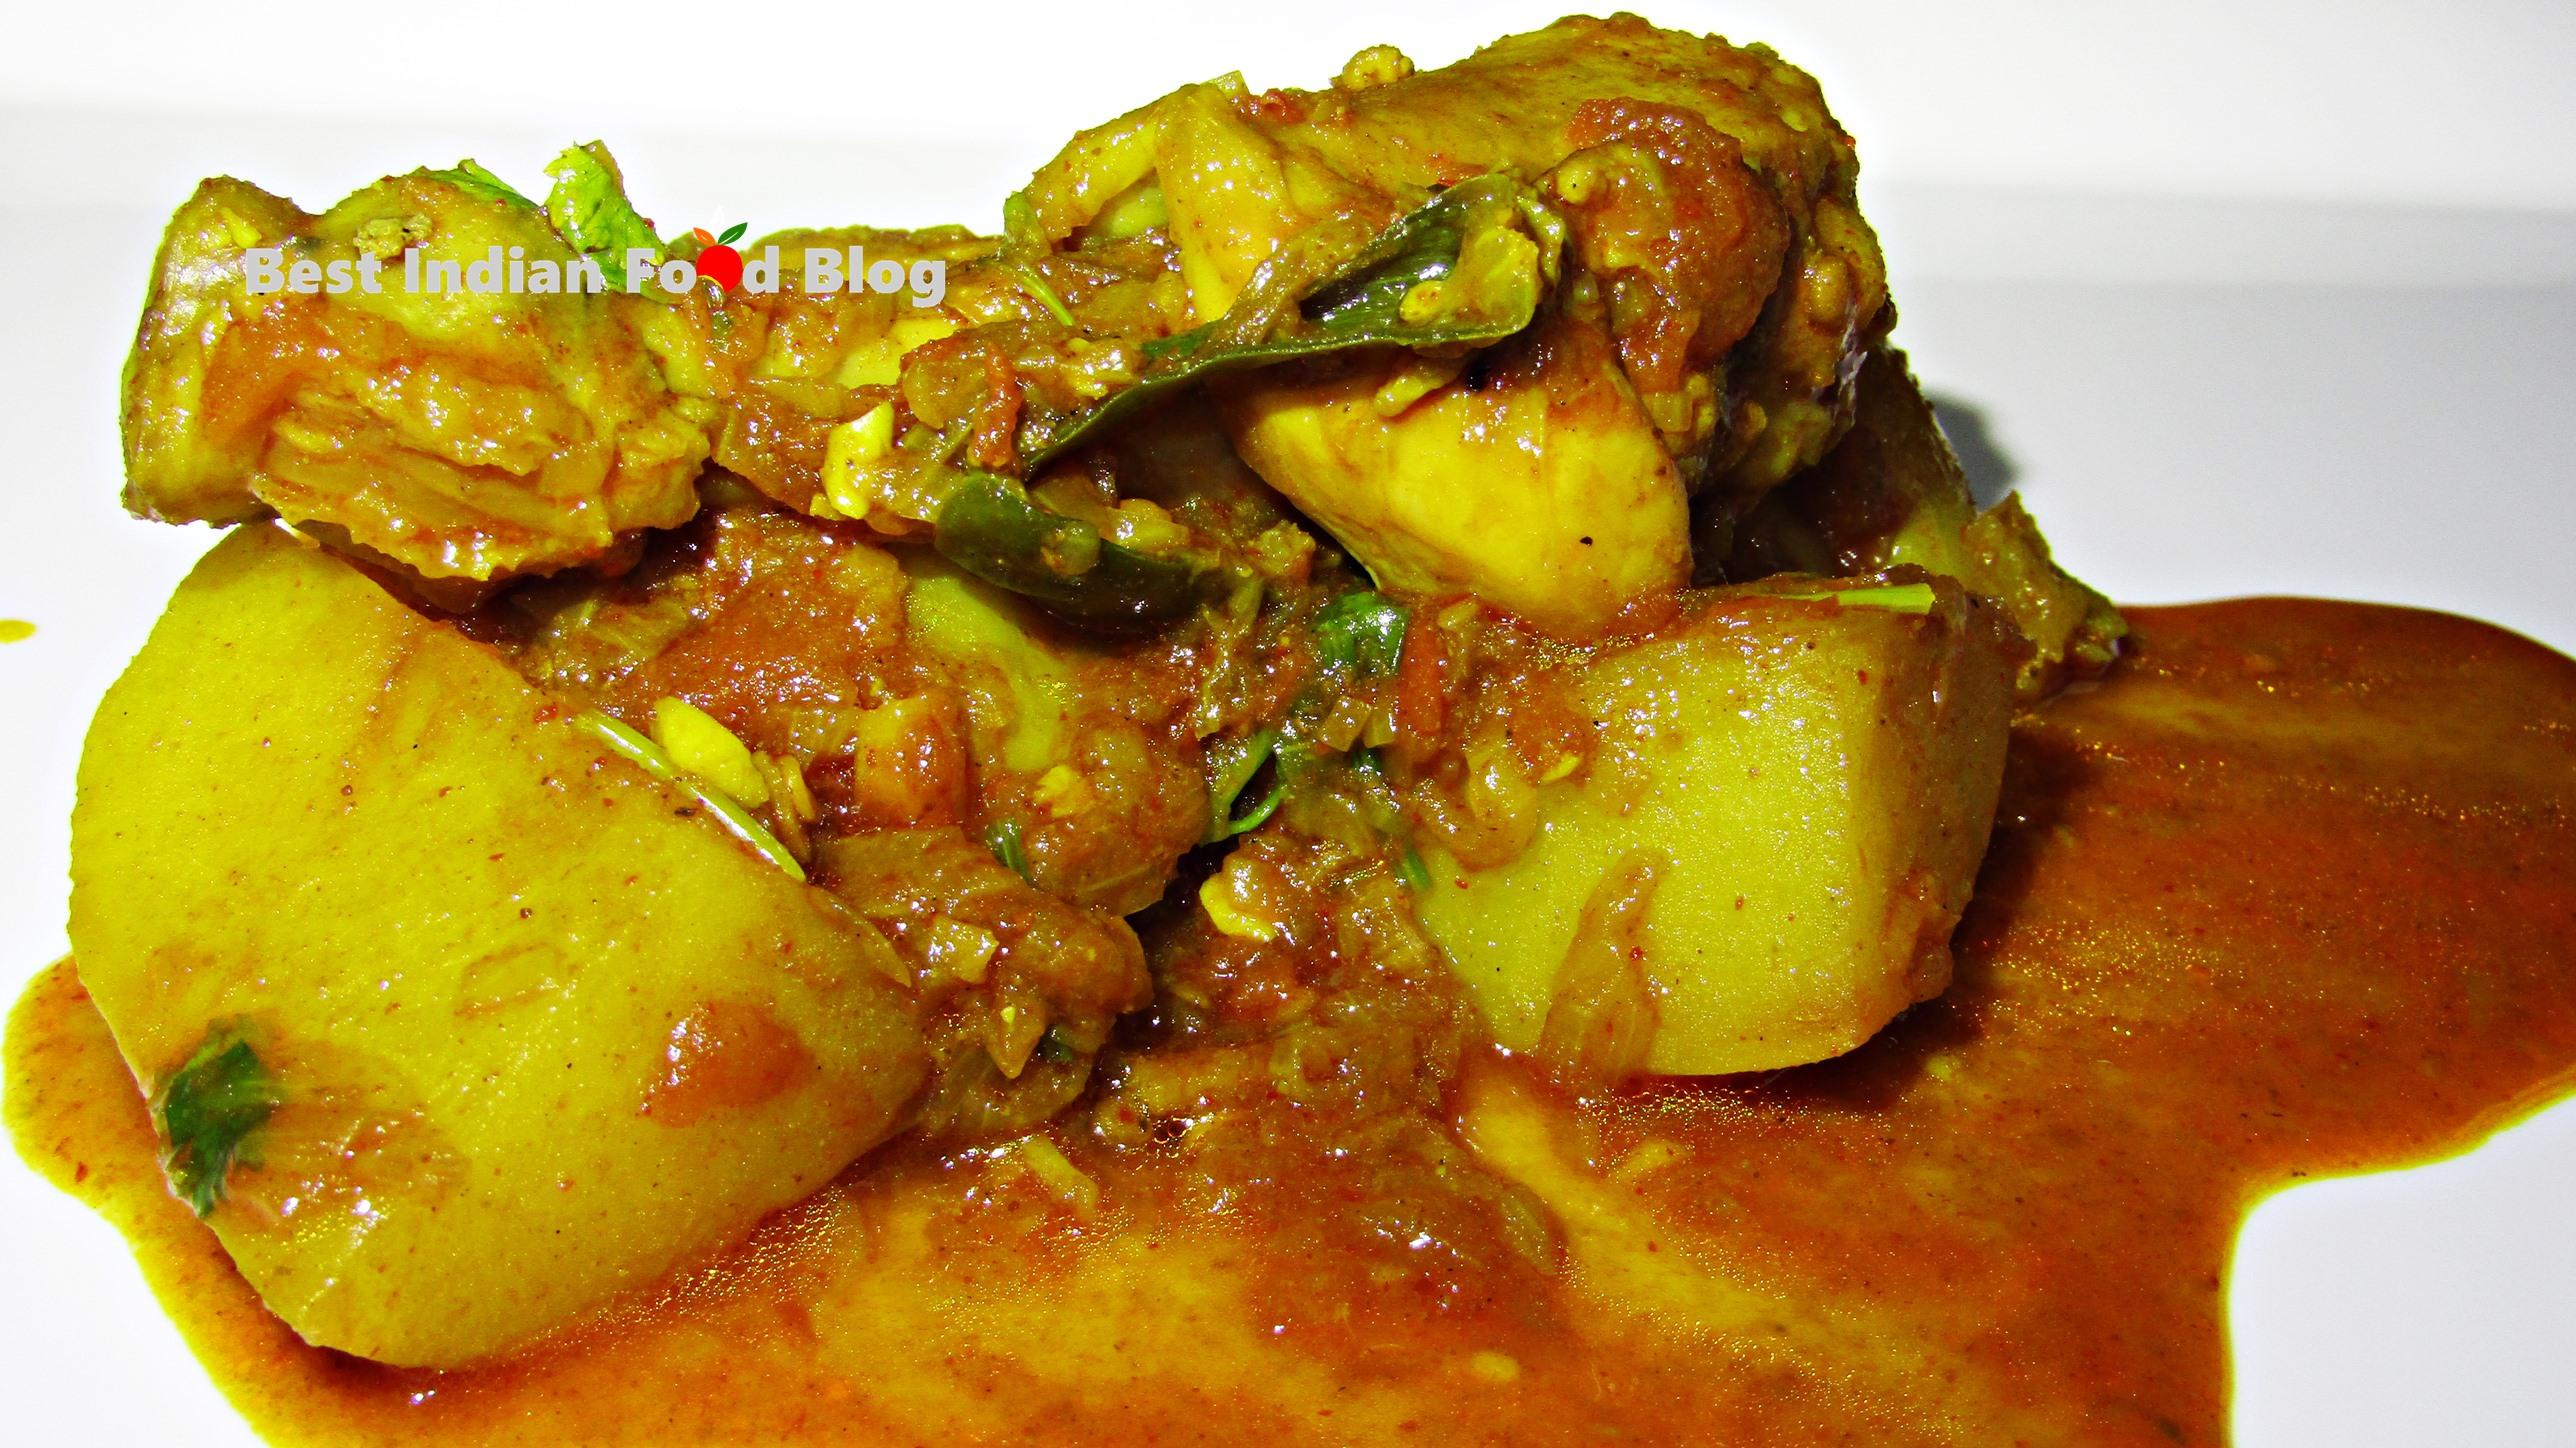 Arsa Kan from Mizoram, India | Best Indian Food Blog | Chicken recipe